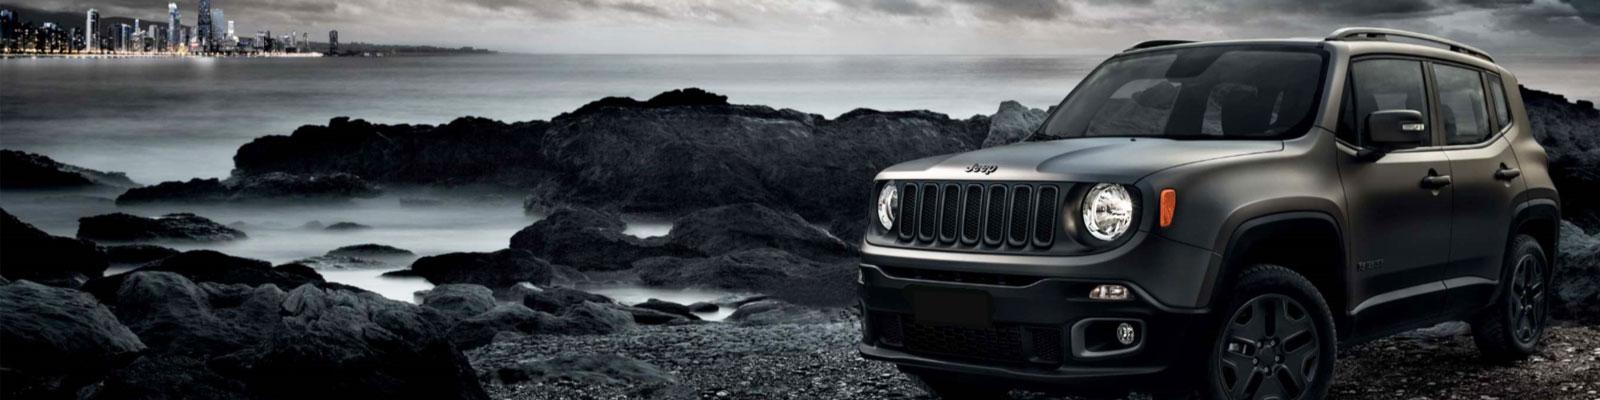 jeep-renegade-bg